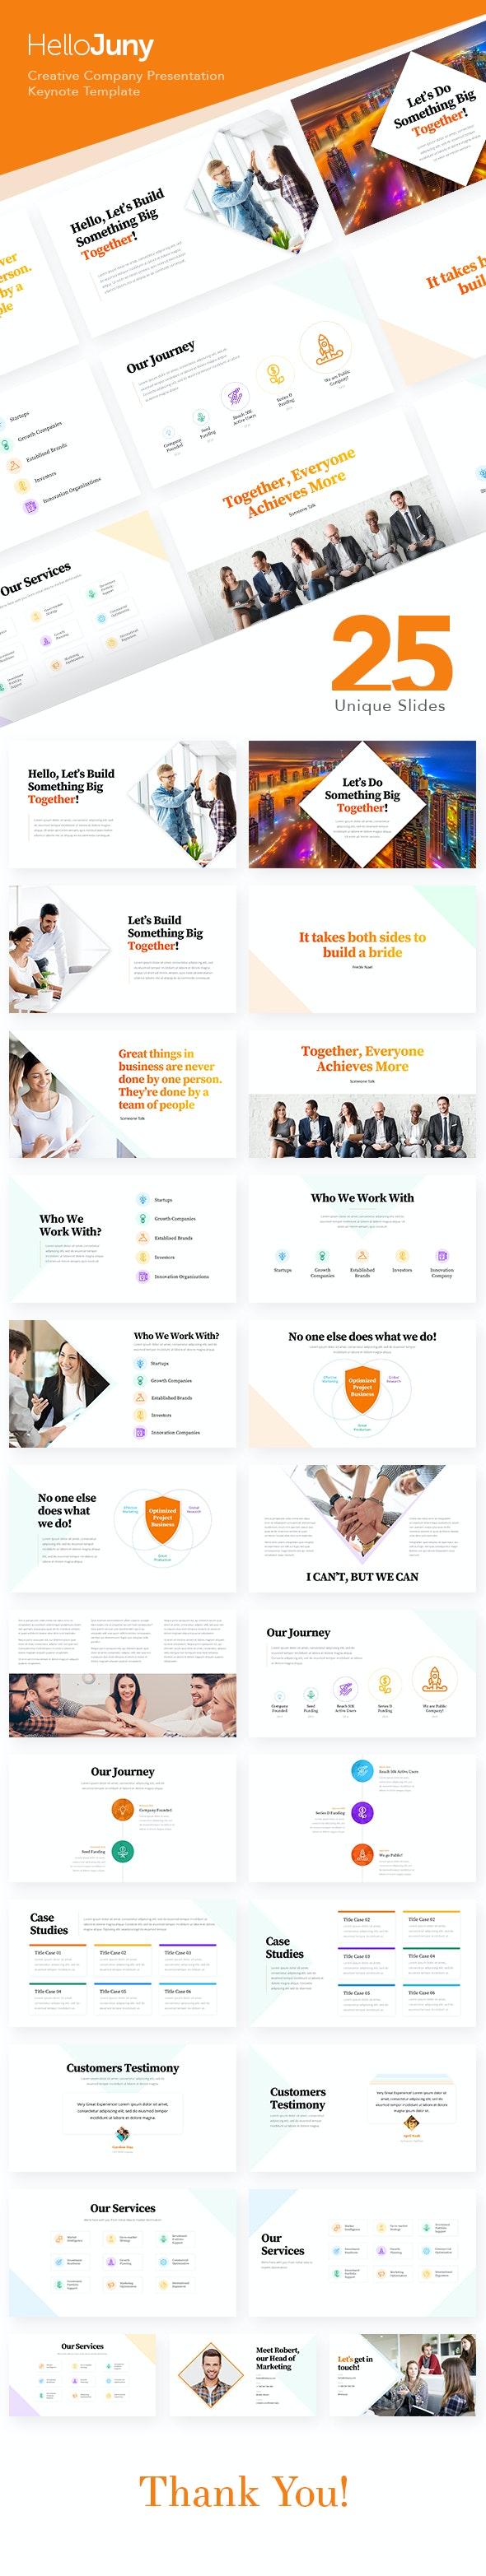 HelloJuny - Creative Company Business Keynote Template - Keynote Templates Presentation Templates